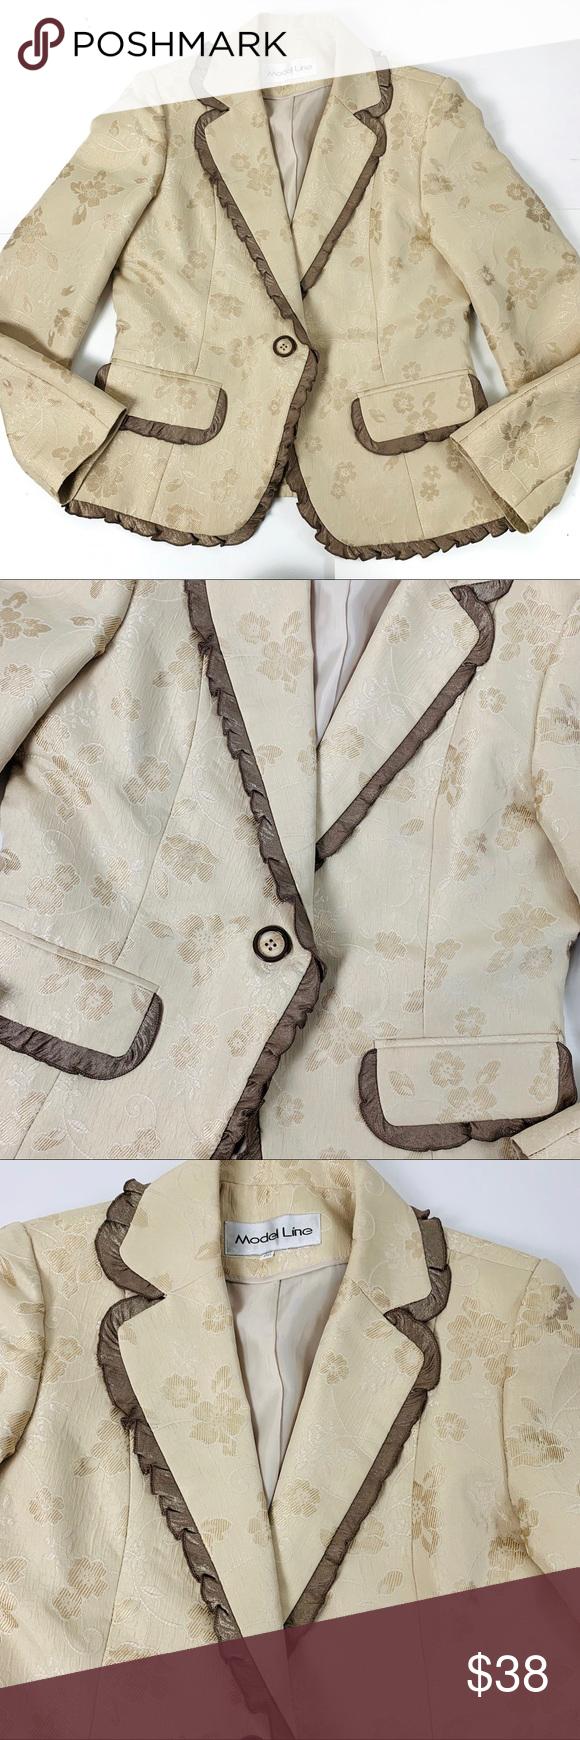 Gorgeous Vintage Blazer with Gold details